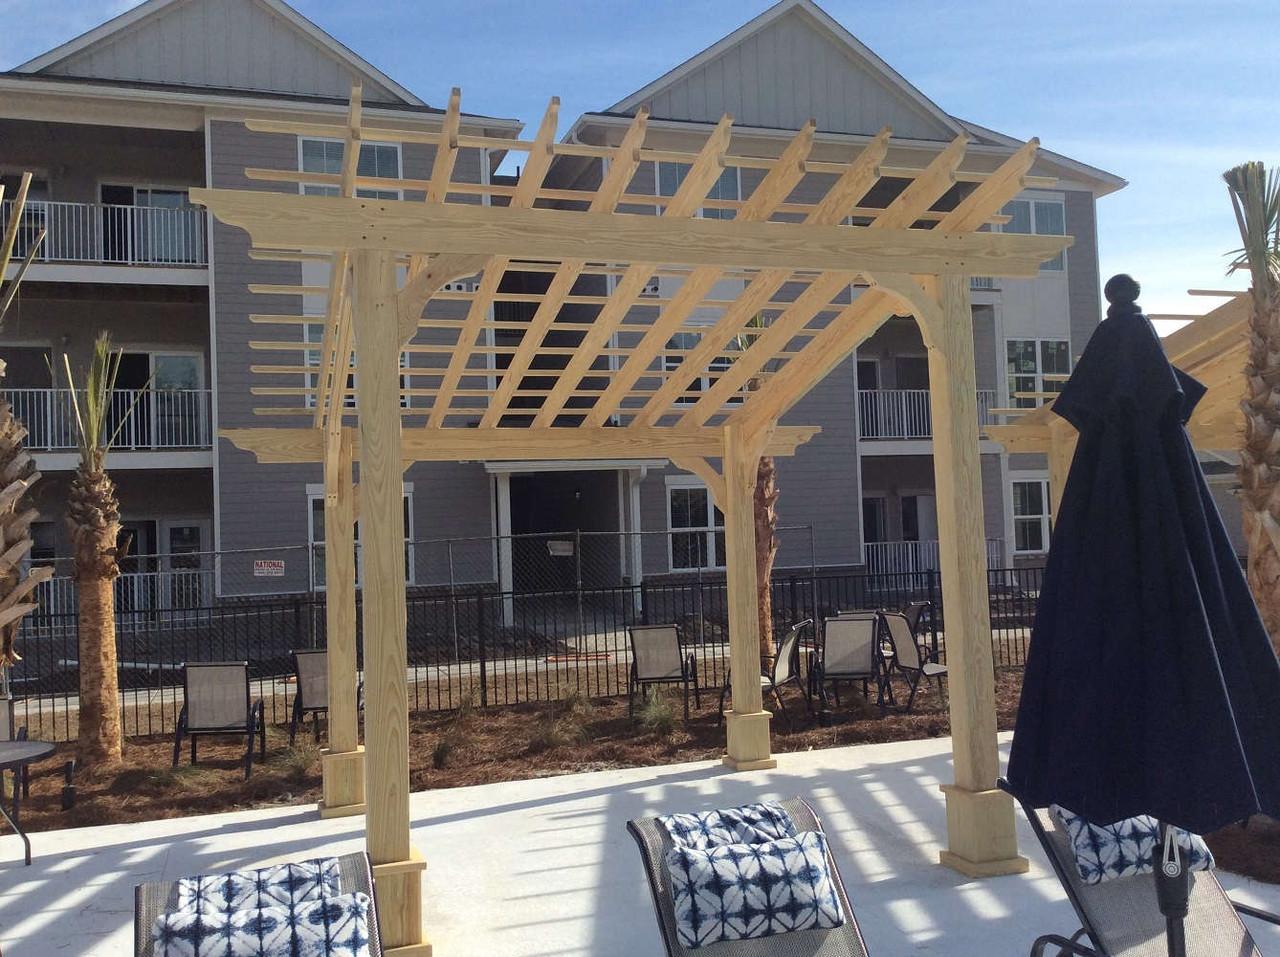 10x10 Classic Slant Roof Pressure Treated Pine Pergola Kit, Summerville, South Carolina